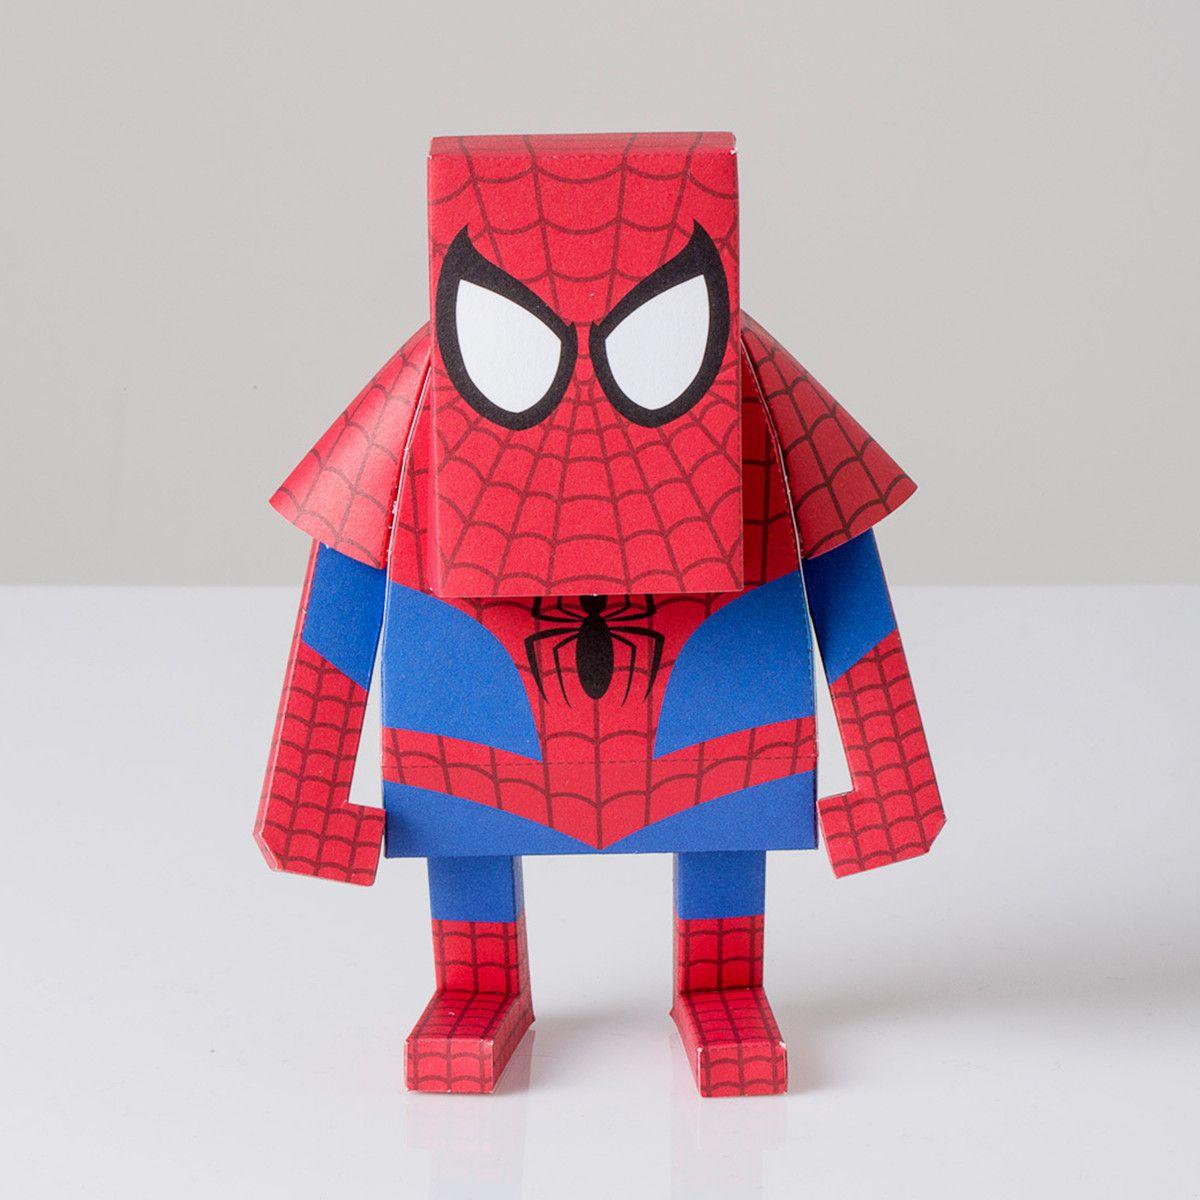 картинки человека-паука из бумаги